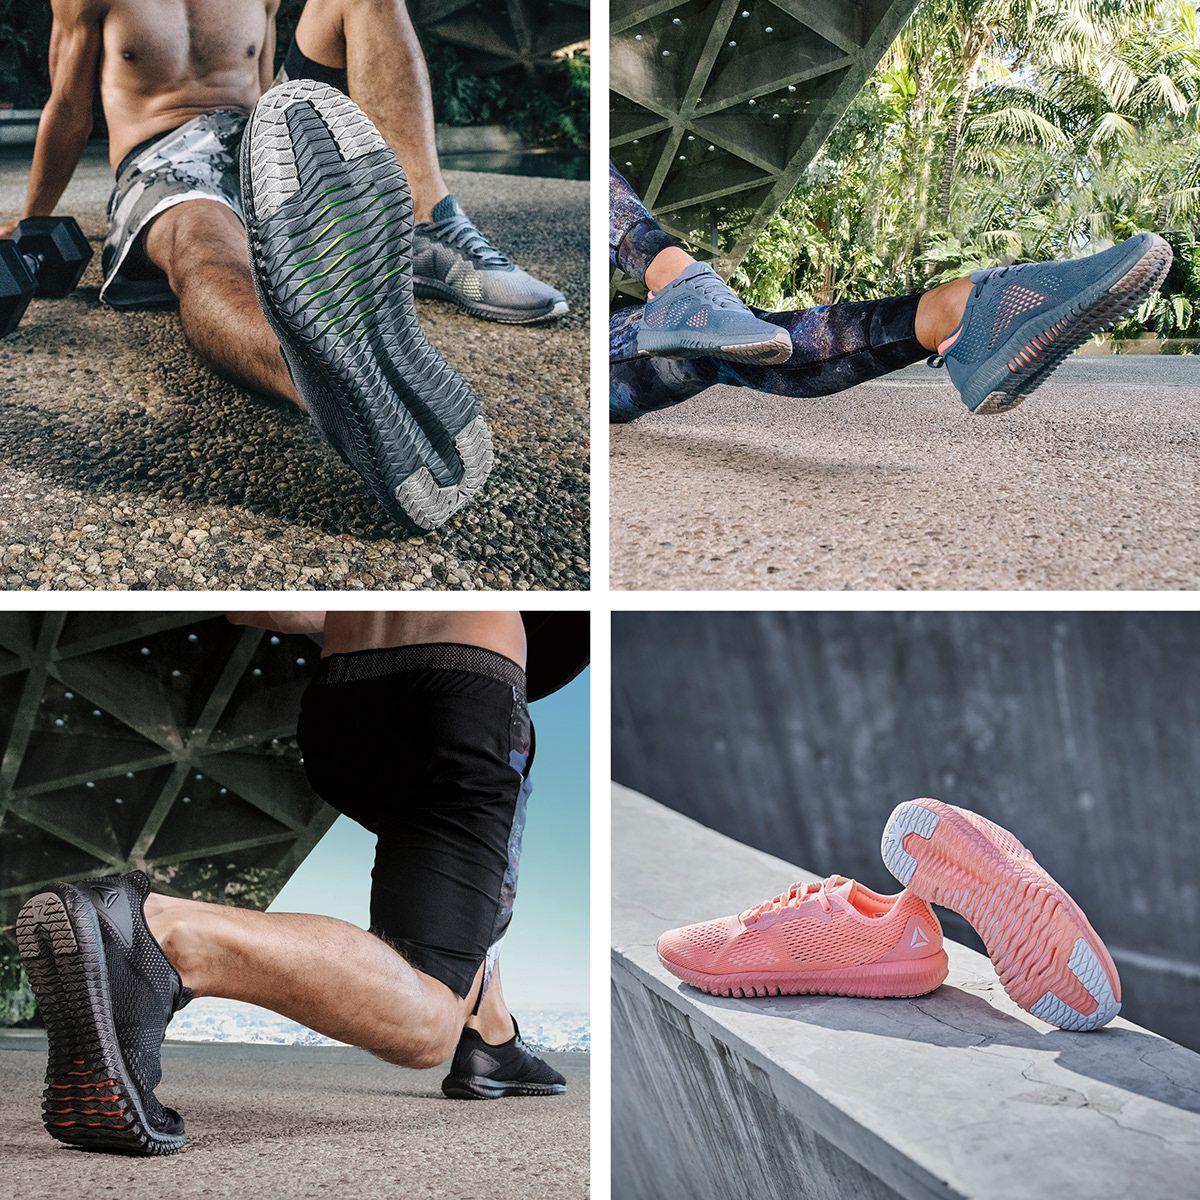 REEBOK FLEXAGON Training Shoes on